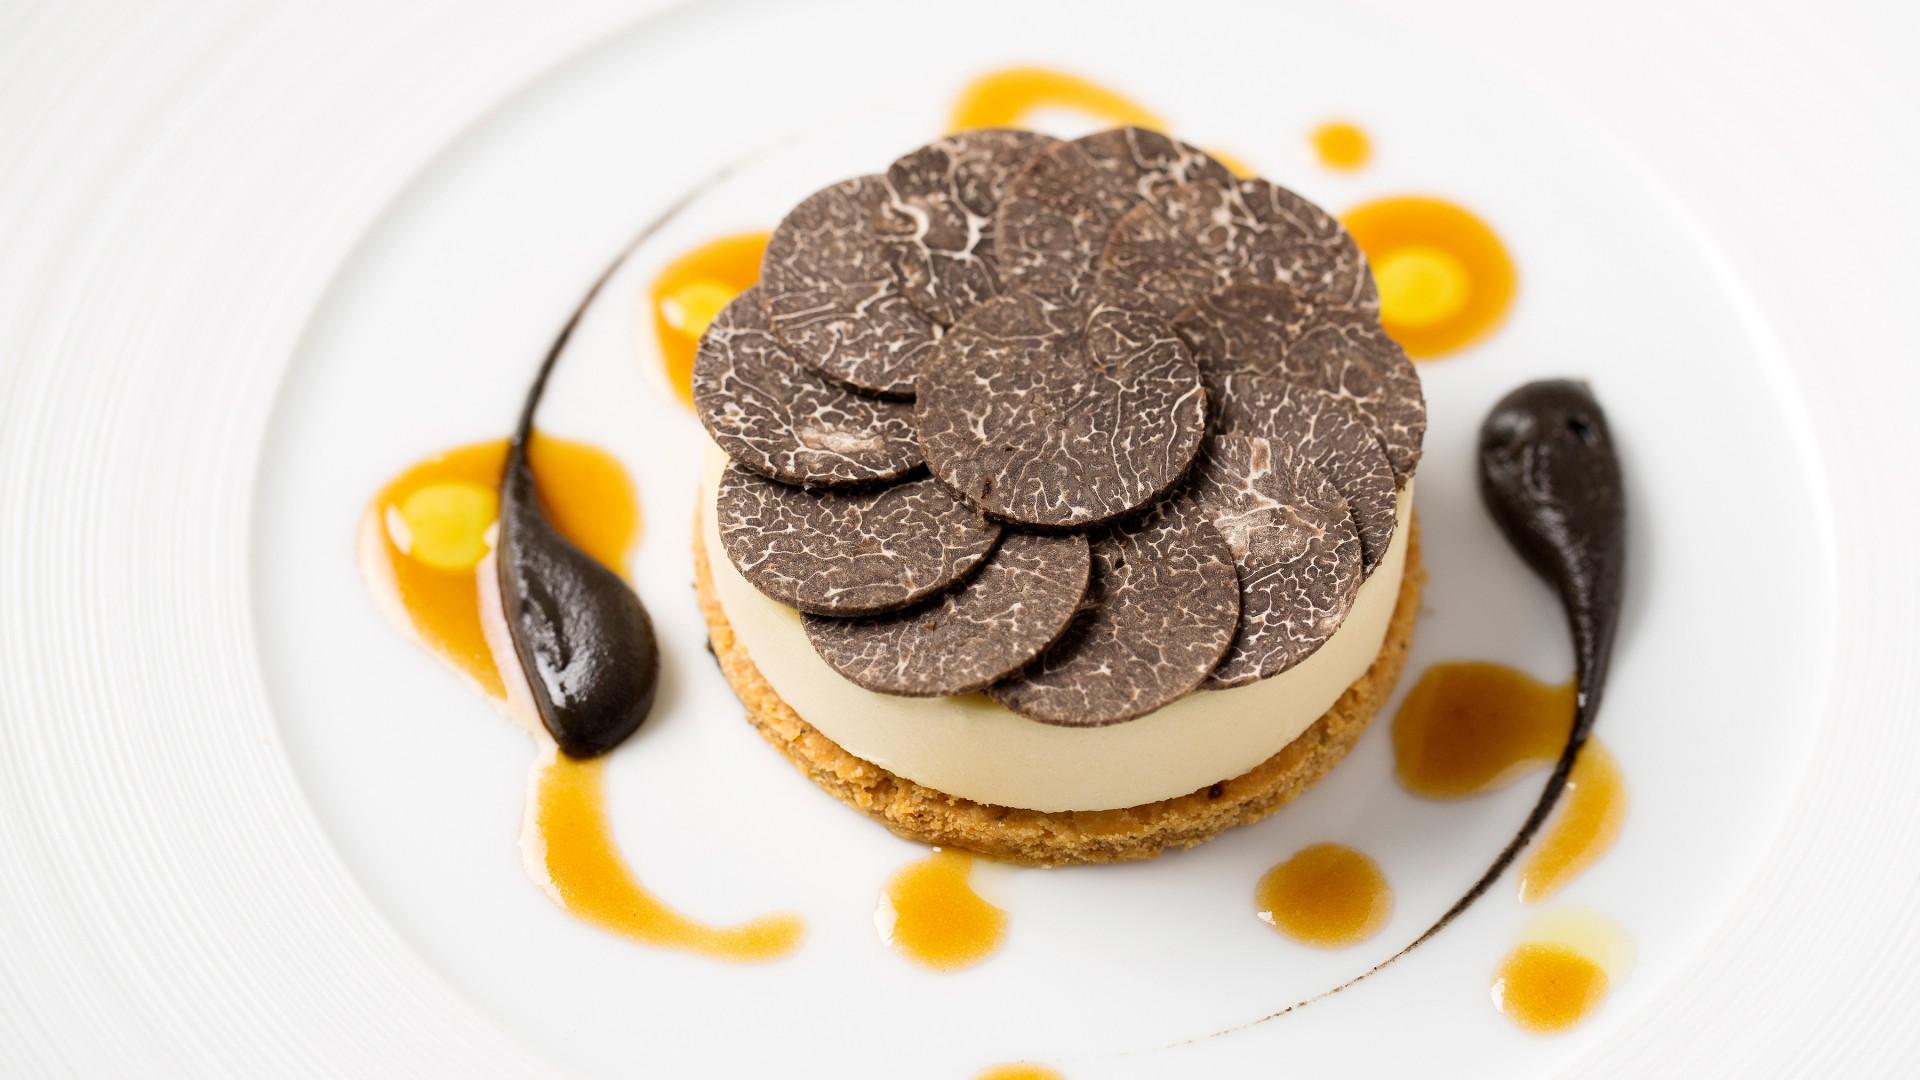 Black truffle, Périgord Jerusalem artichoke, Noir de Bigorre ham